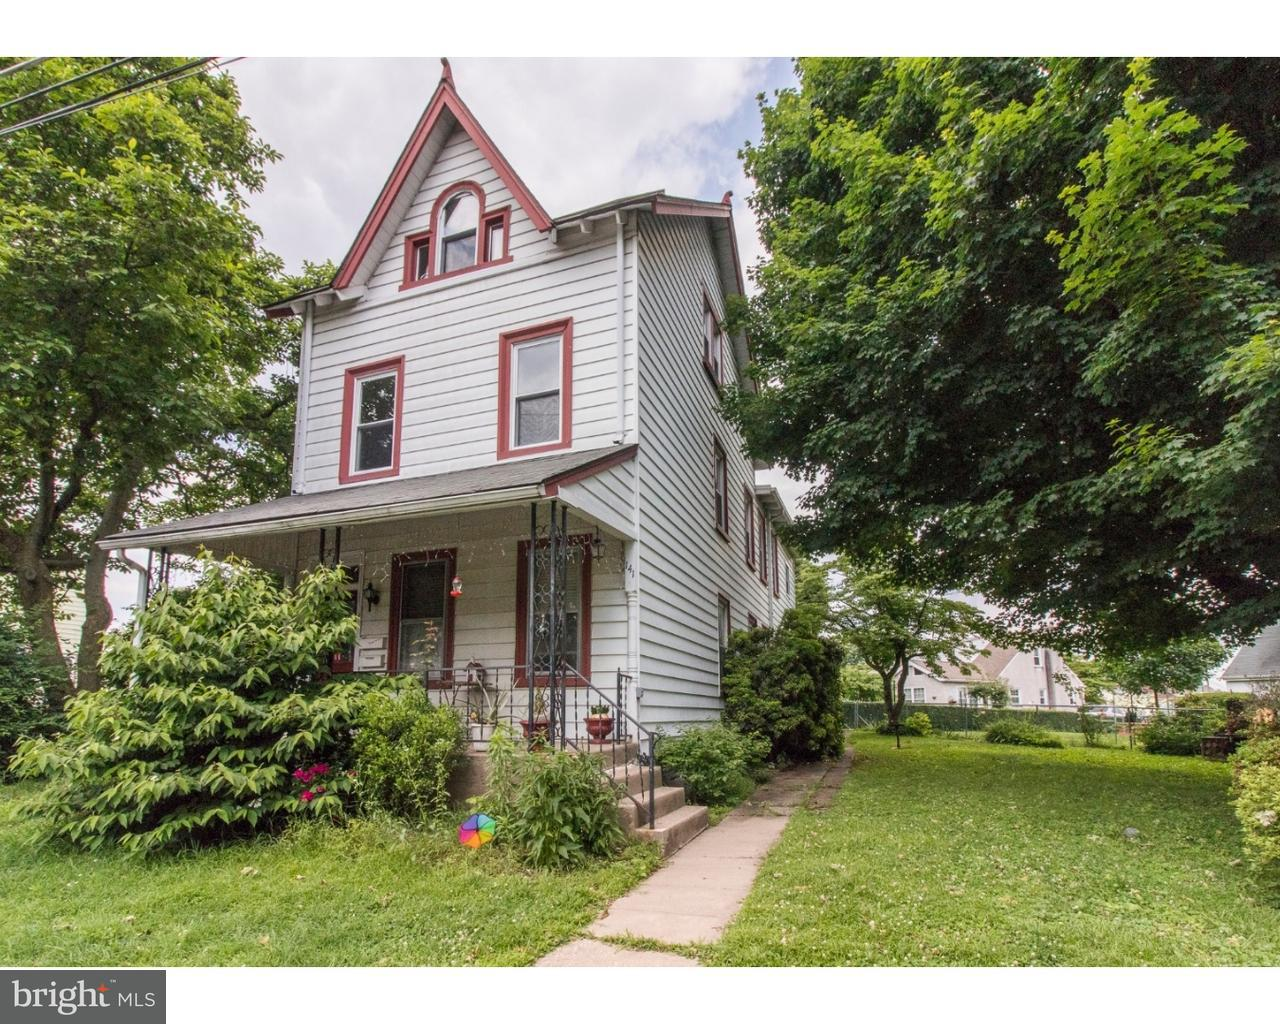 141 Maple Avenue Belmont Hills, PA 19004